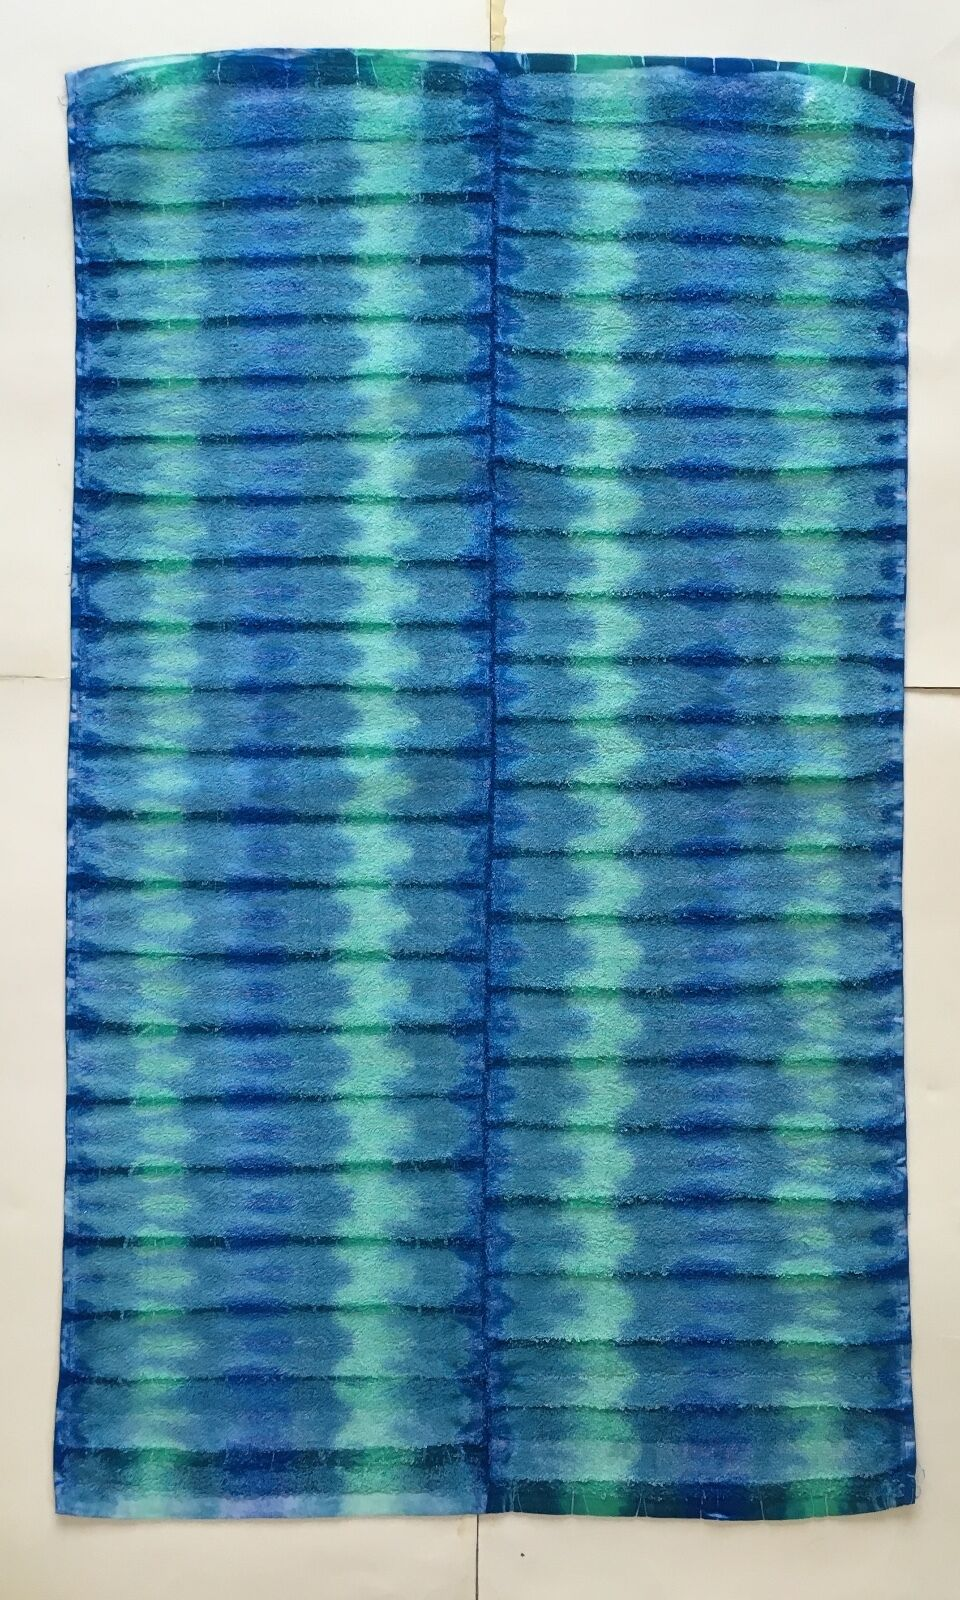 *New* Handmade Tie Dye Vertical Blues Washcloth Hand, Bath Towel, Single or Set